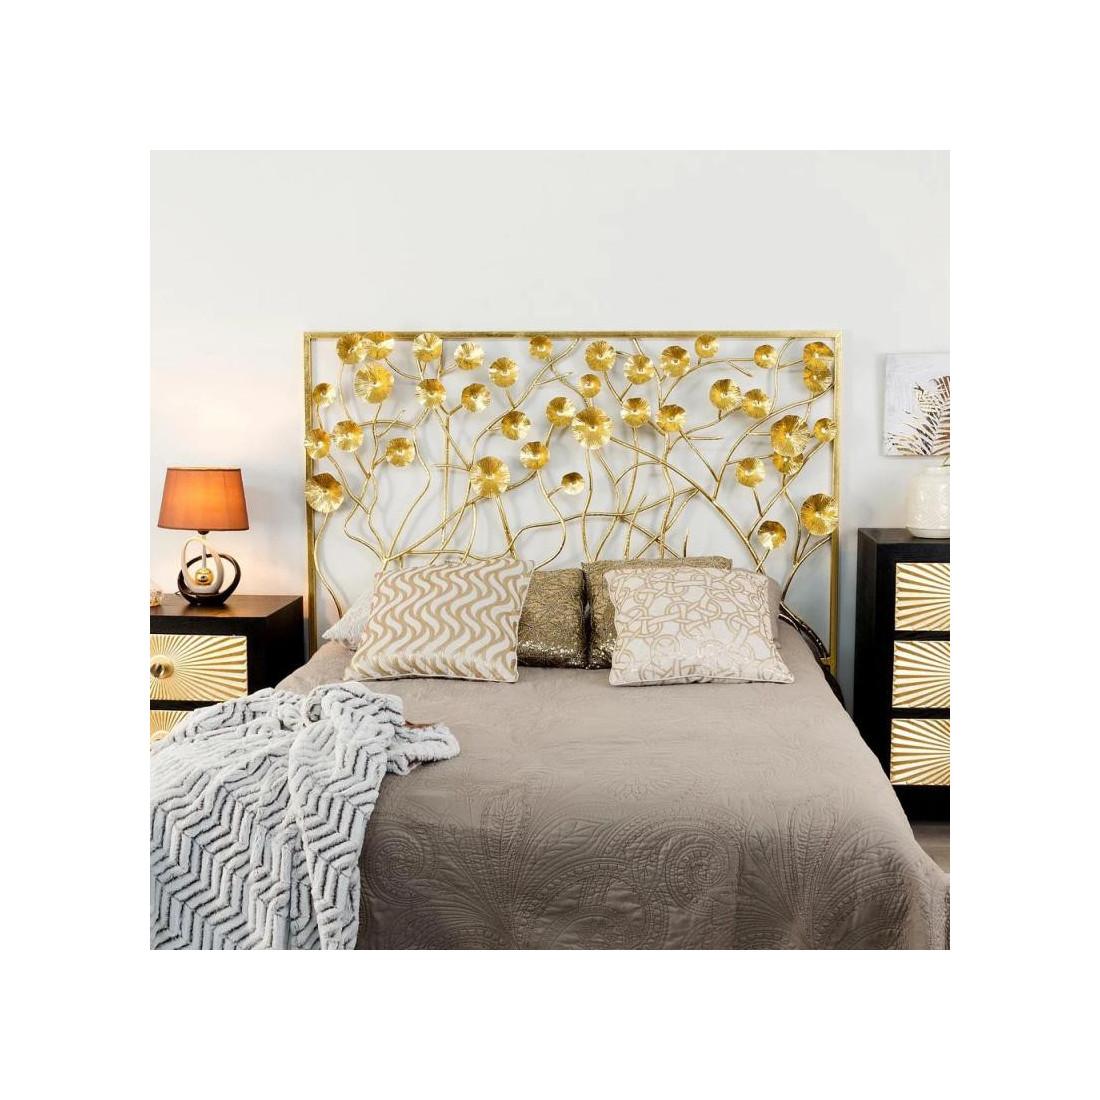 t te de lit 160 cm m tal or goldy univers de la chambre. Black Bedroom Furniture Sets. Home Design Ideas